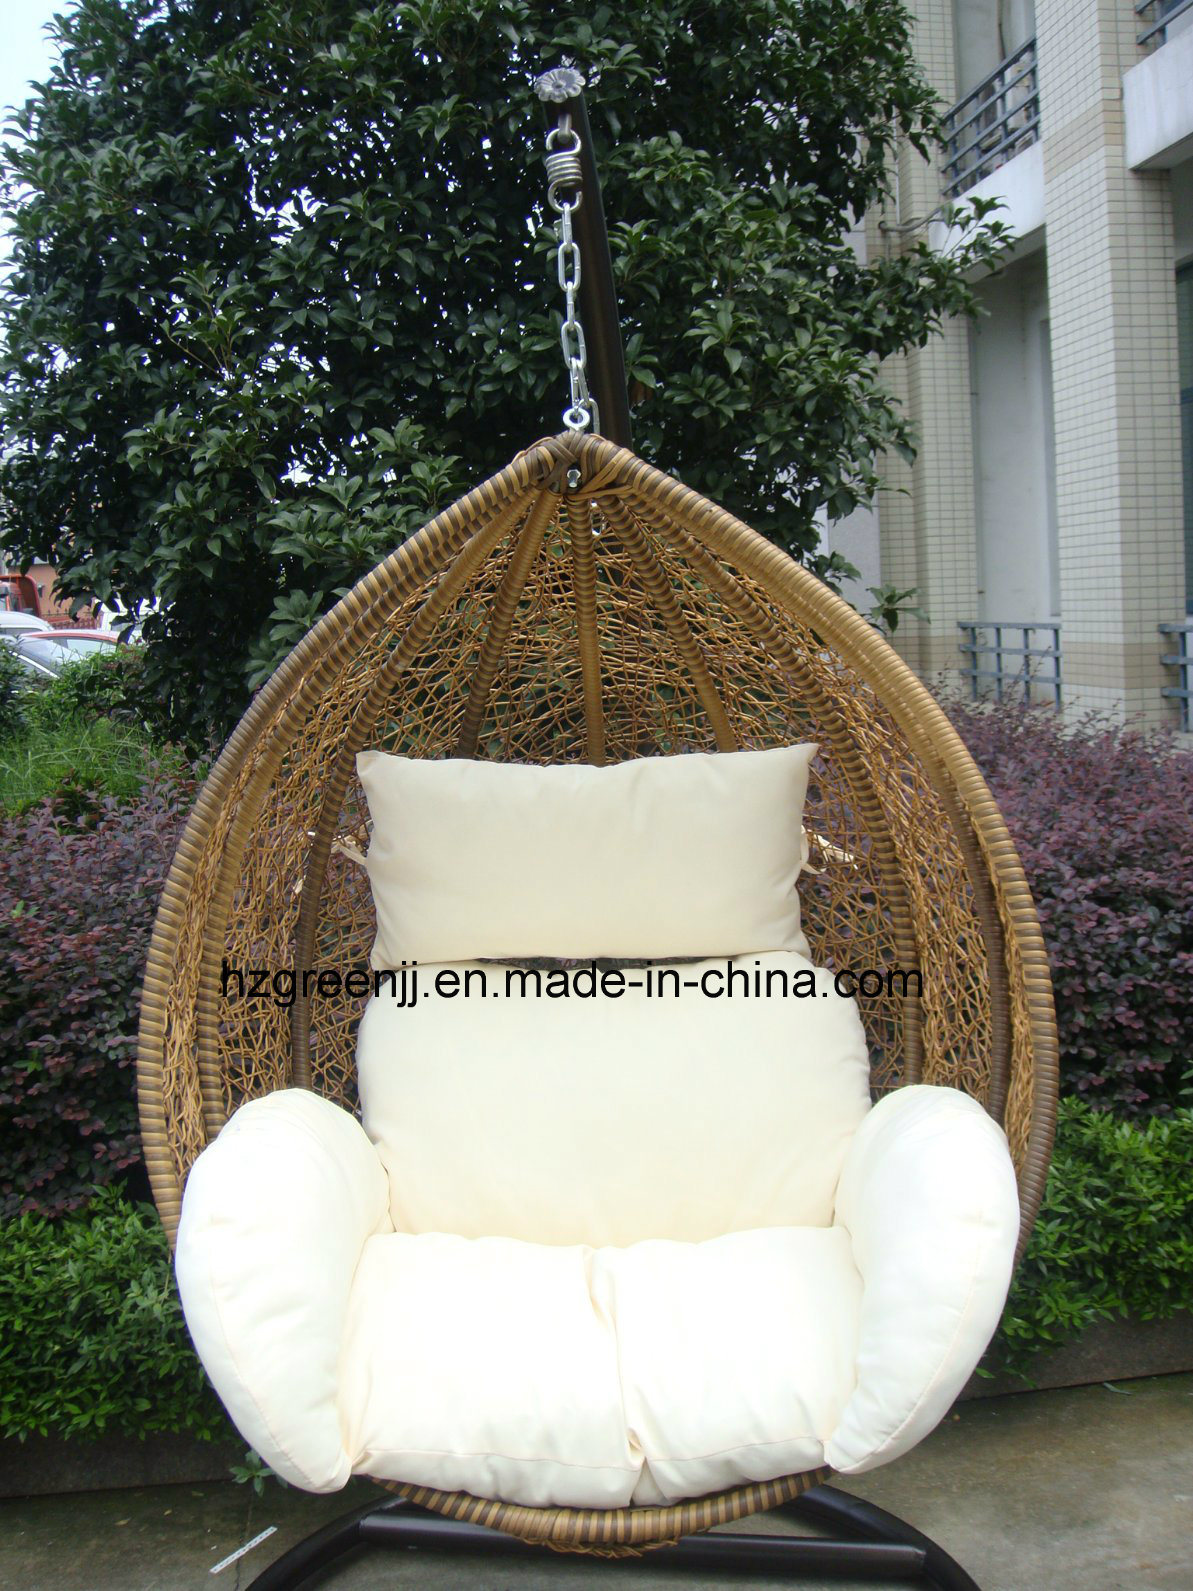 Garden Rattan Swing Chair